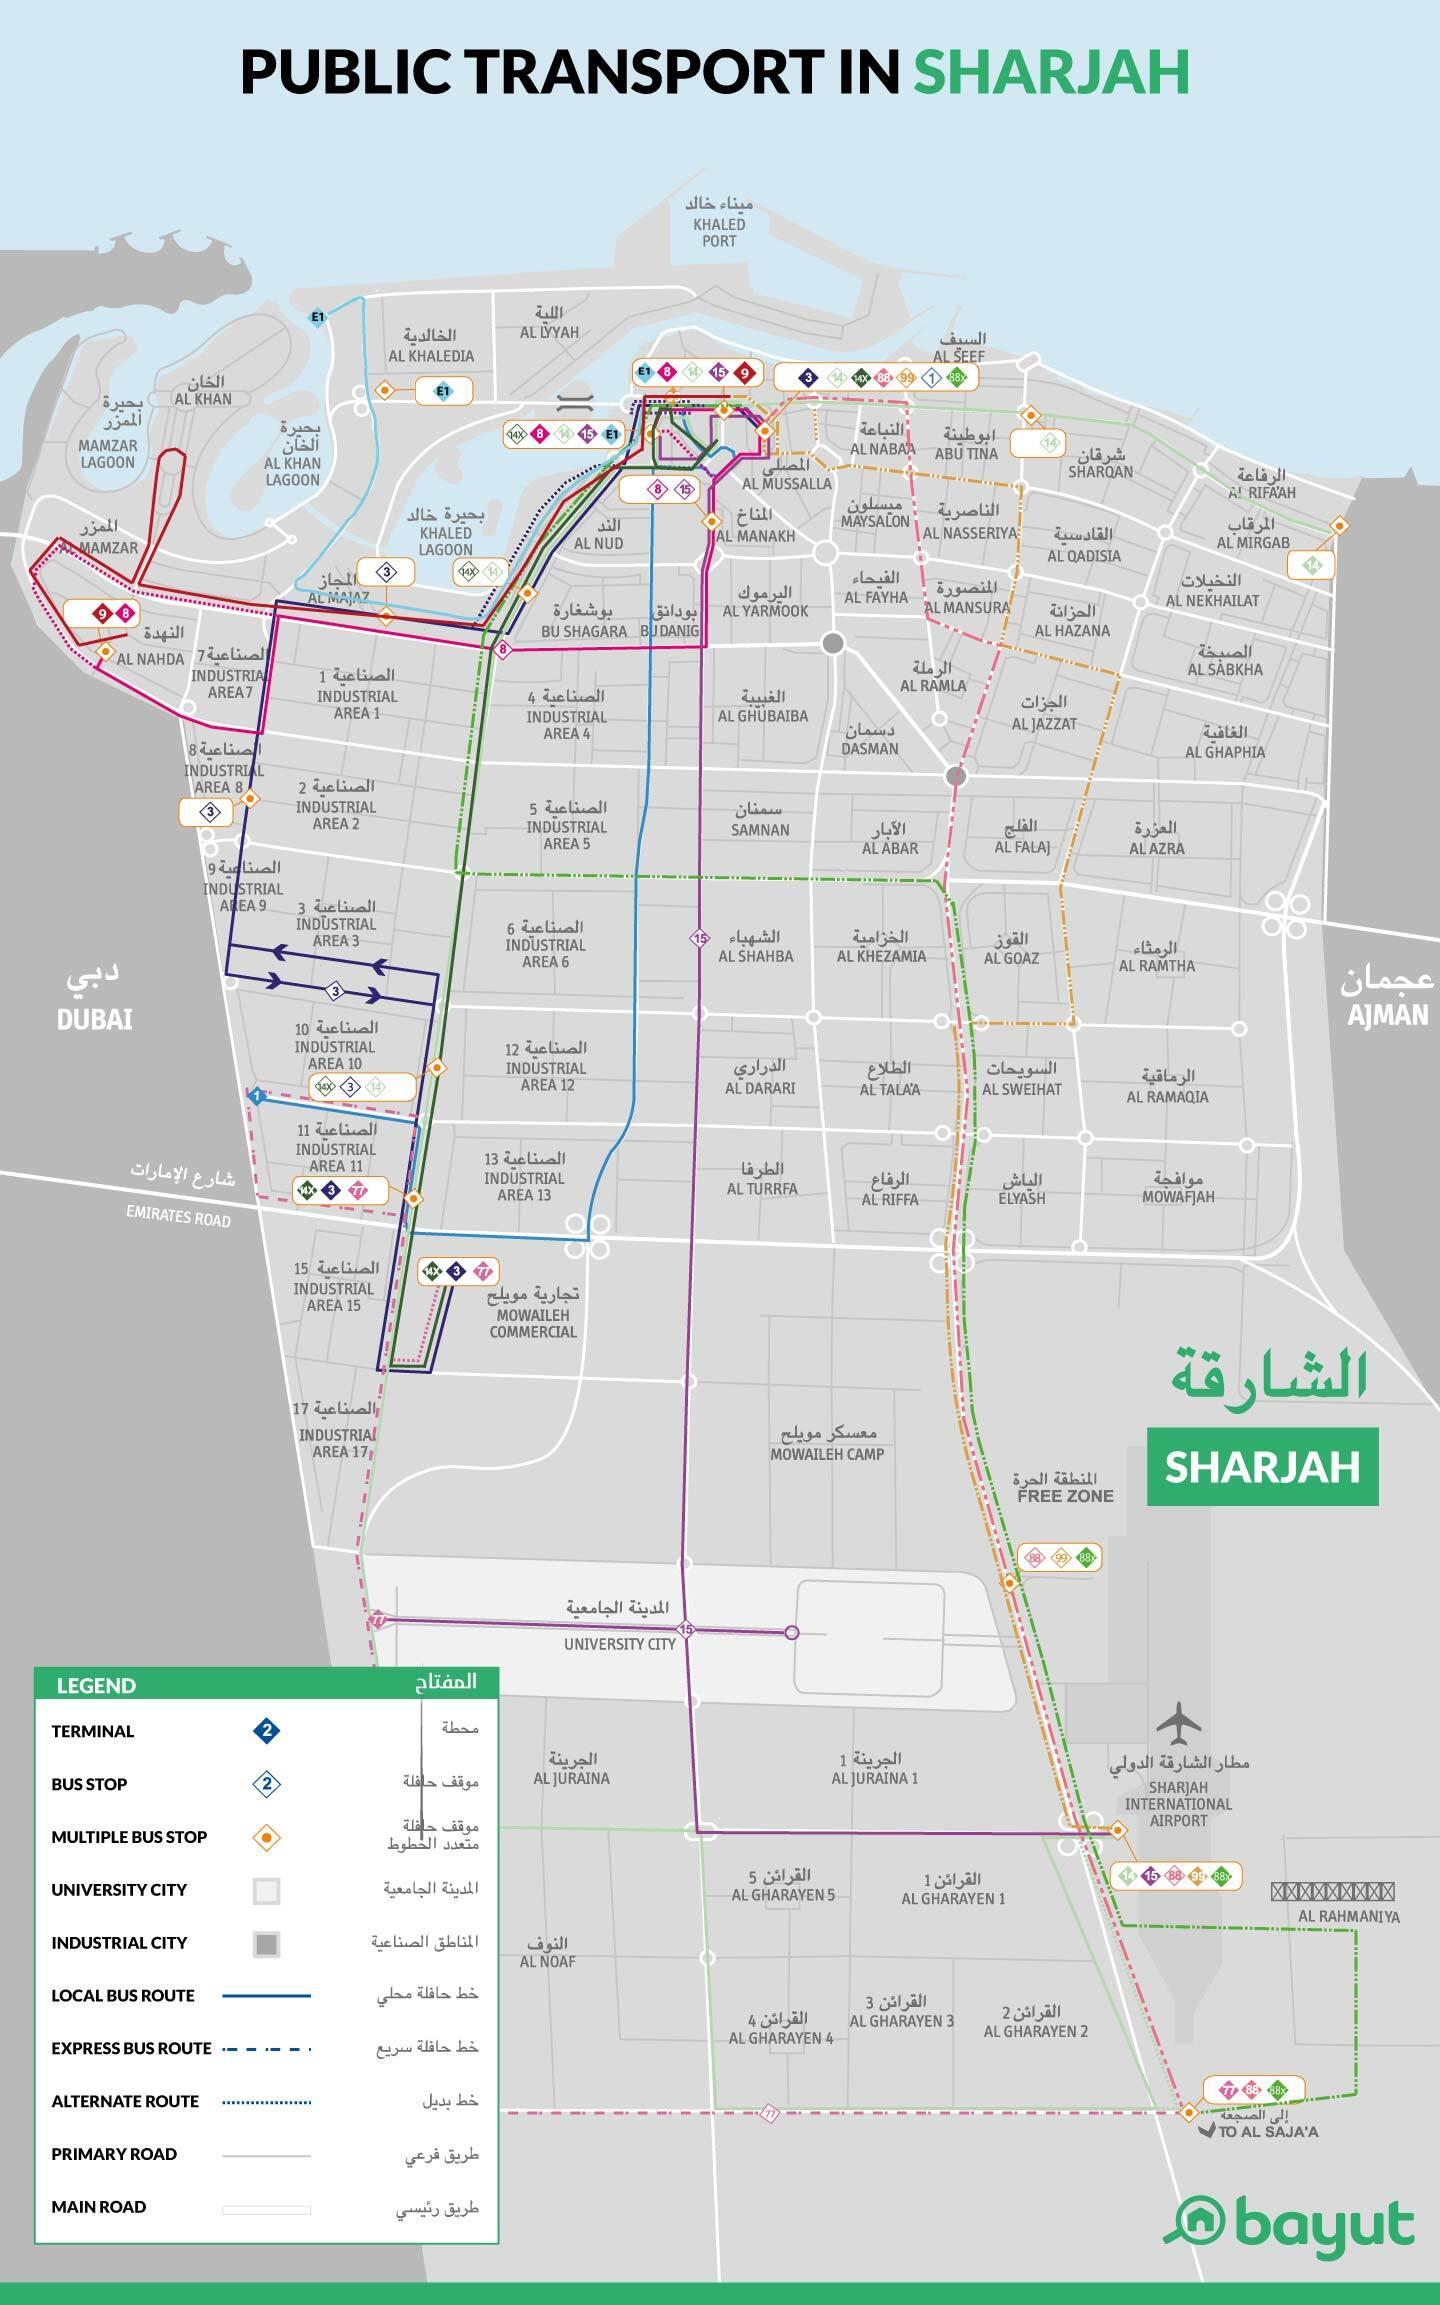 Network map of Mowasalat Bus service